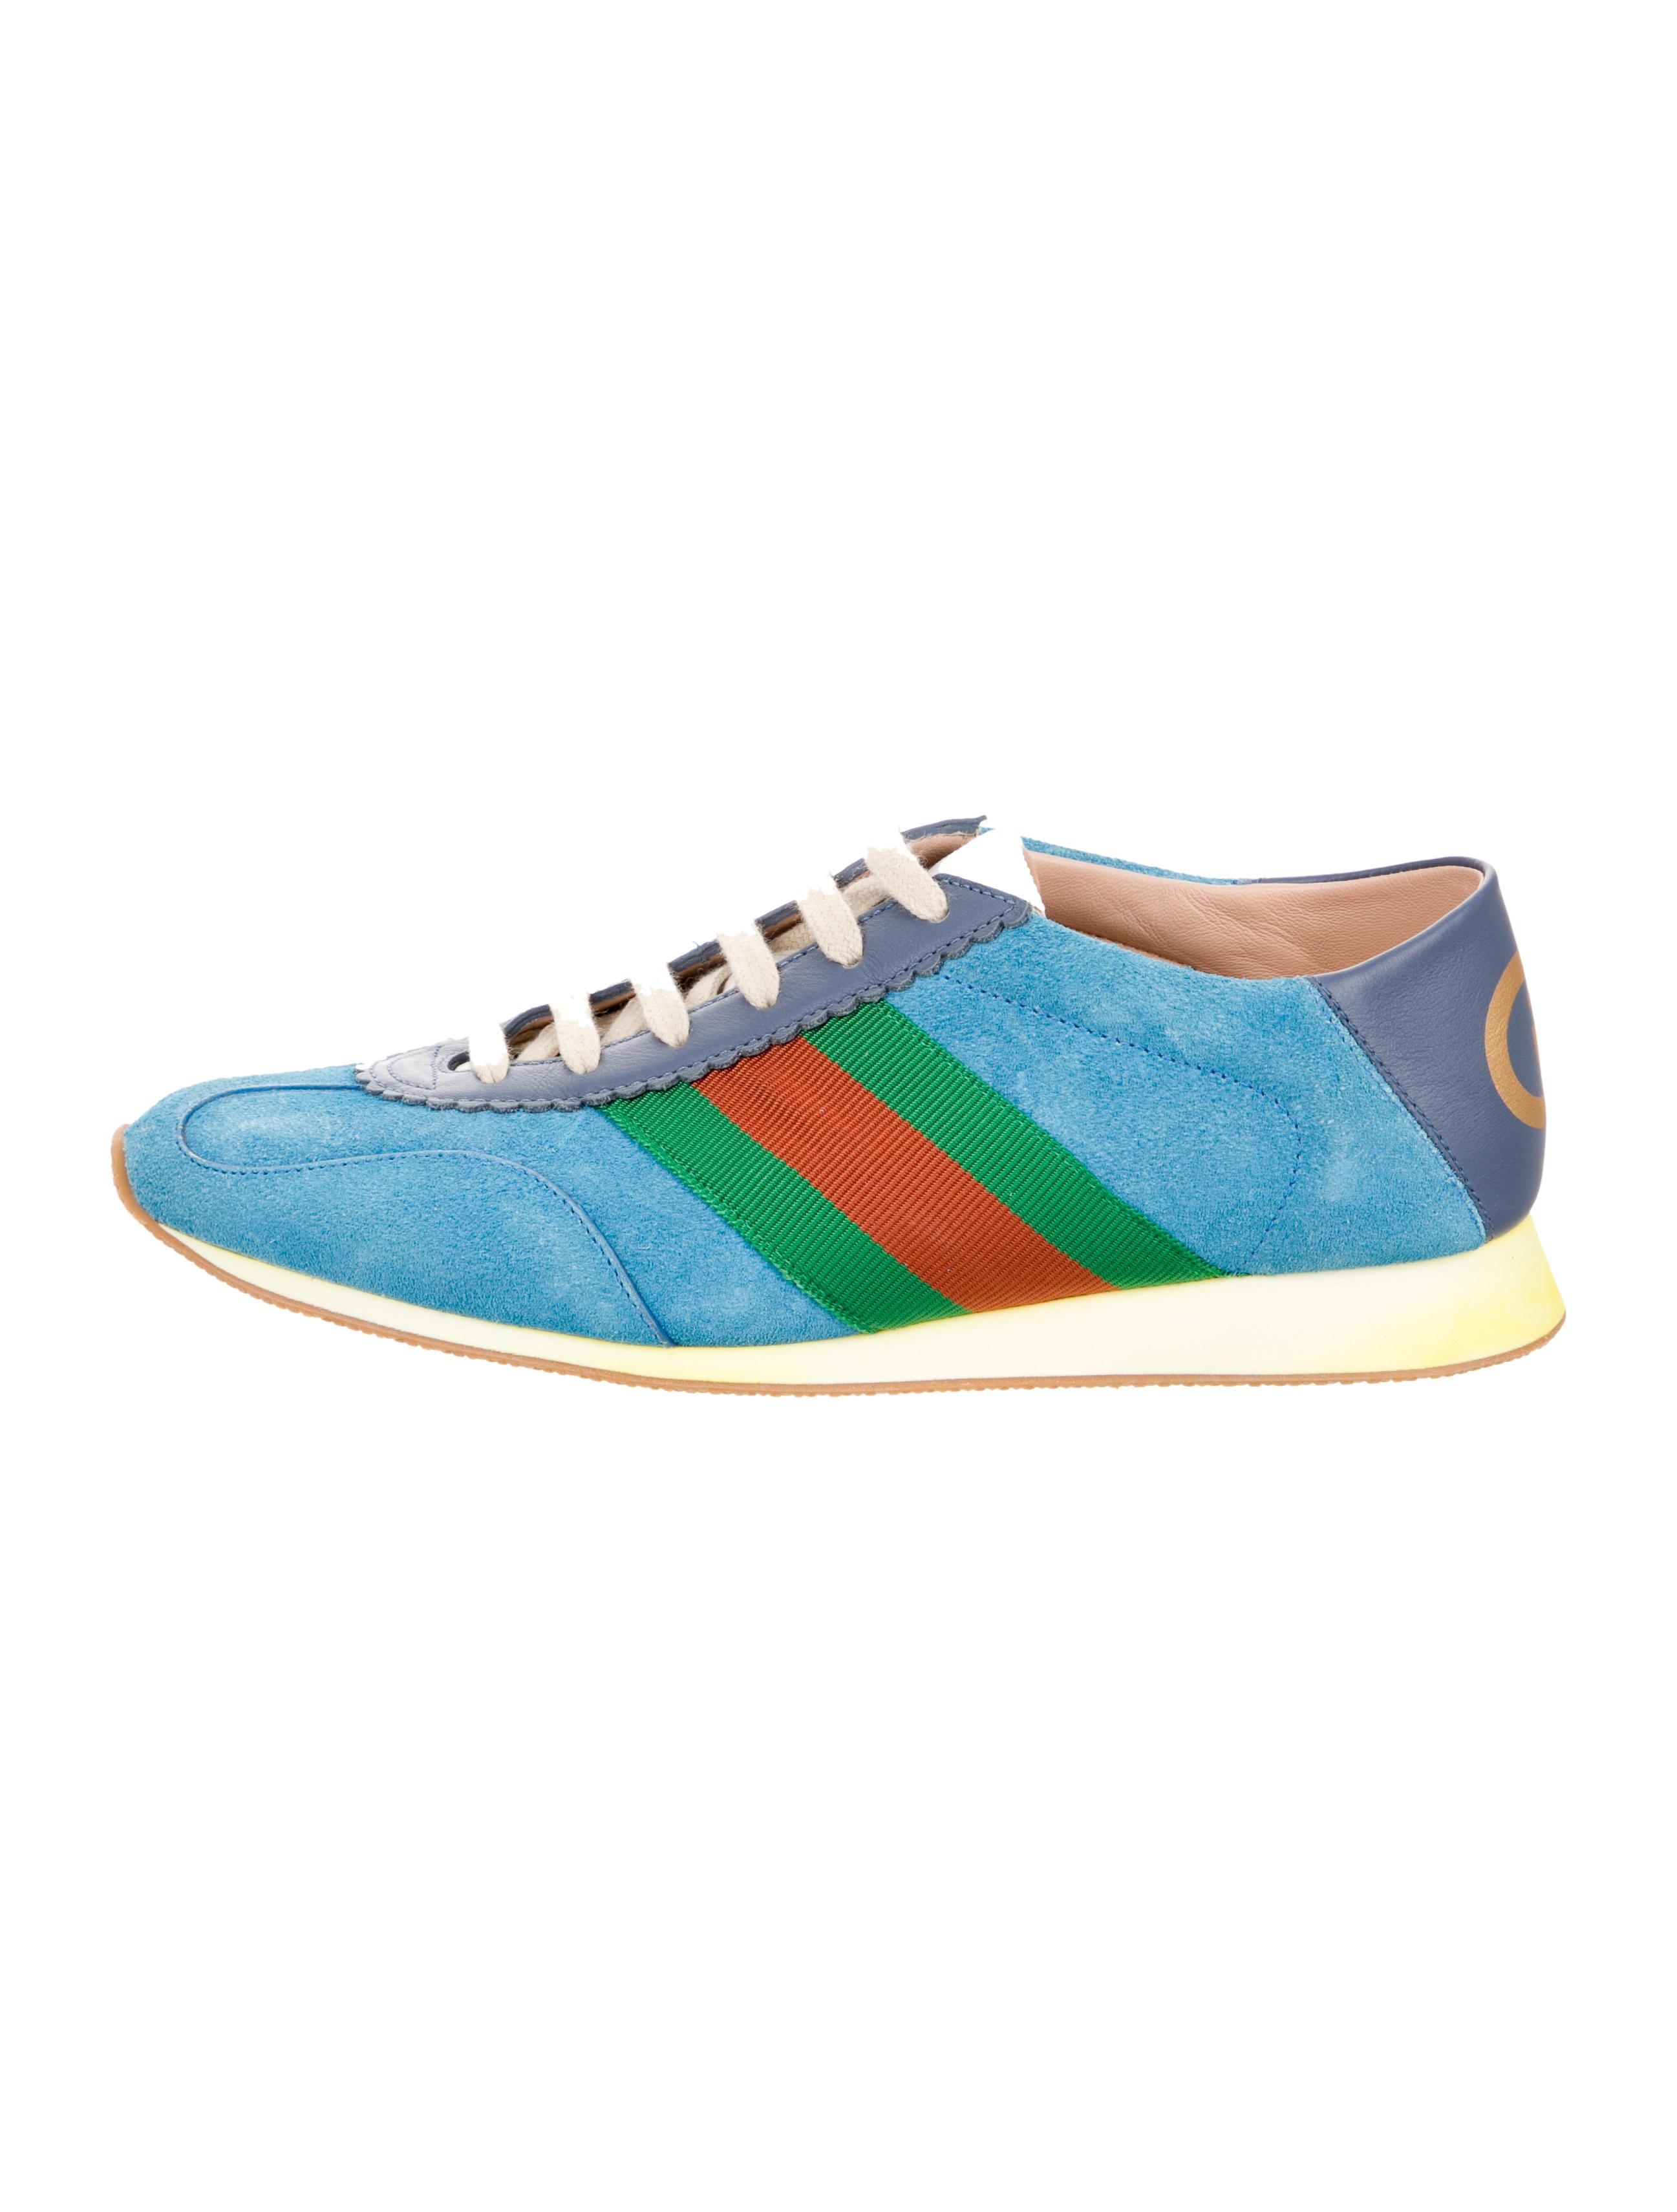 Gucci Rocket Suede Sneaker - Shoes